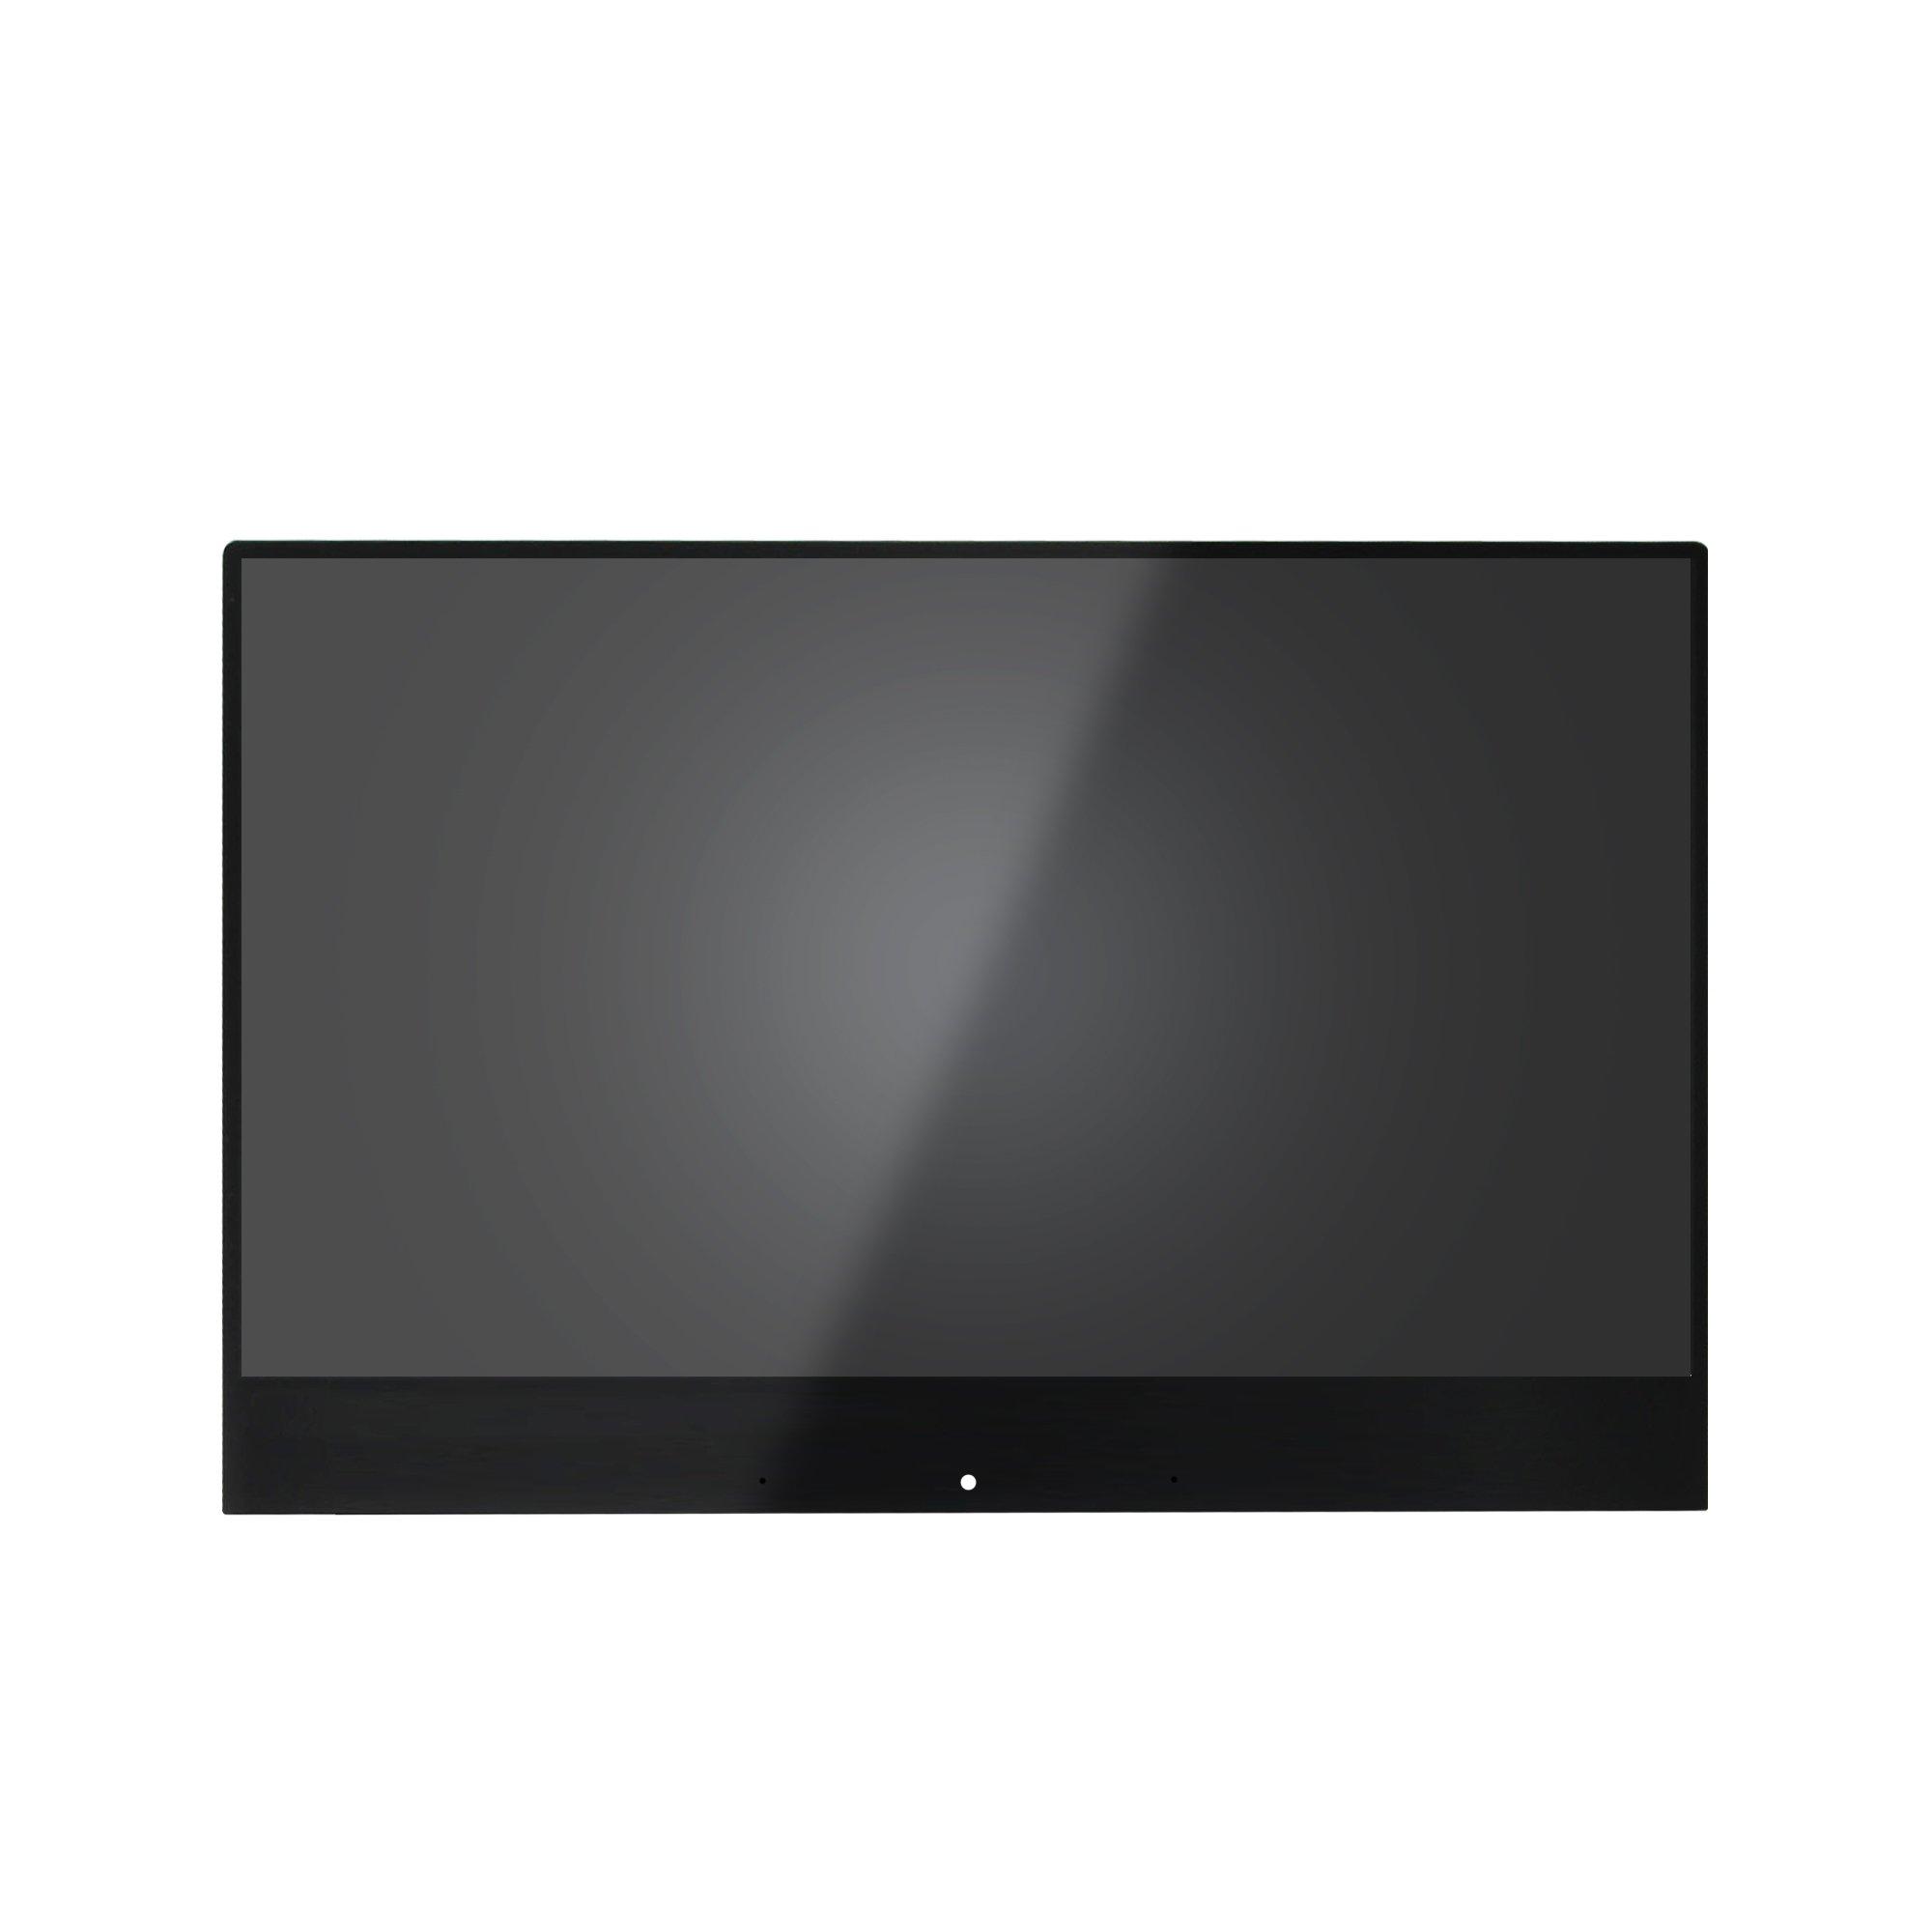 FTDLCD® 14 pulgada 4K LED LCD Pantalla Táctil Digitalizador Panel Repuesto de Asamblea para Lenovo Yoga 910-13IKB 80VF00A8US (Dorado Cable): Amazon.es: Electrónica